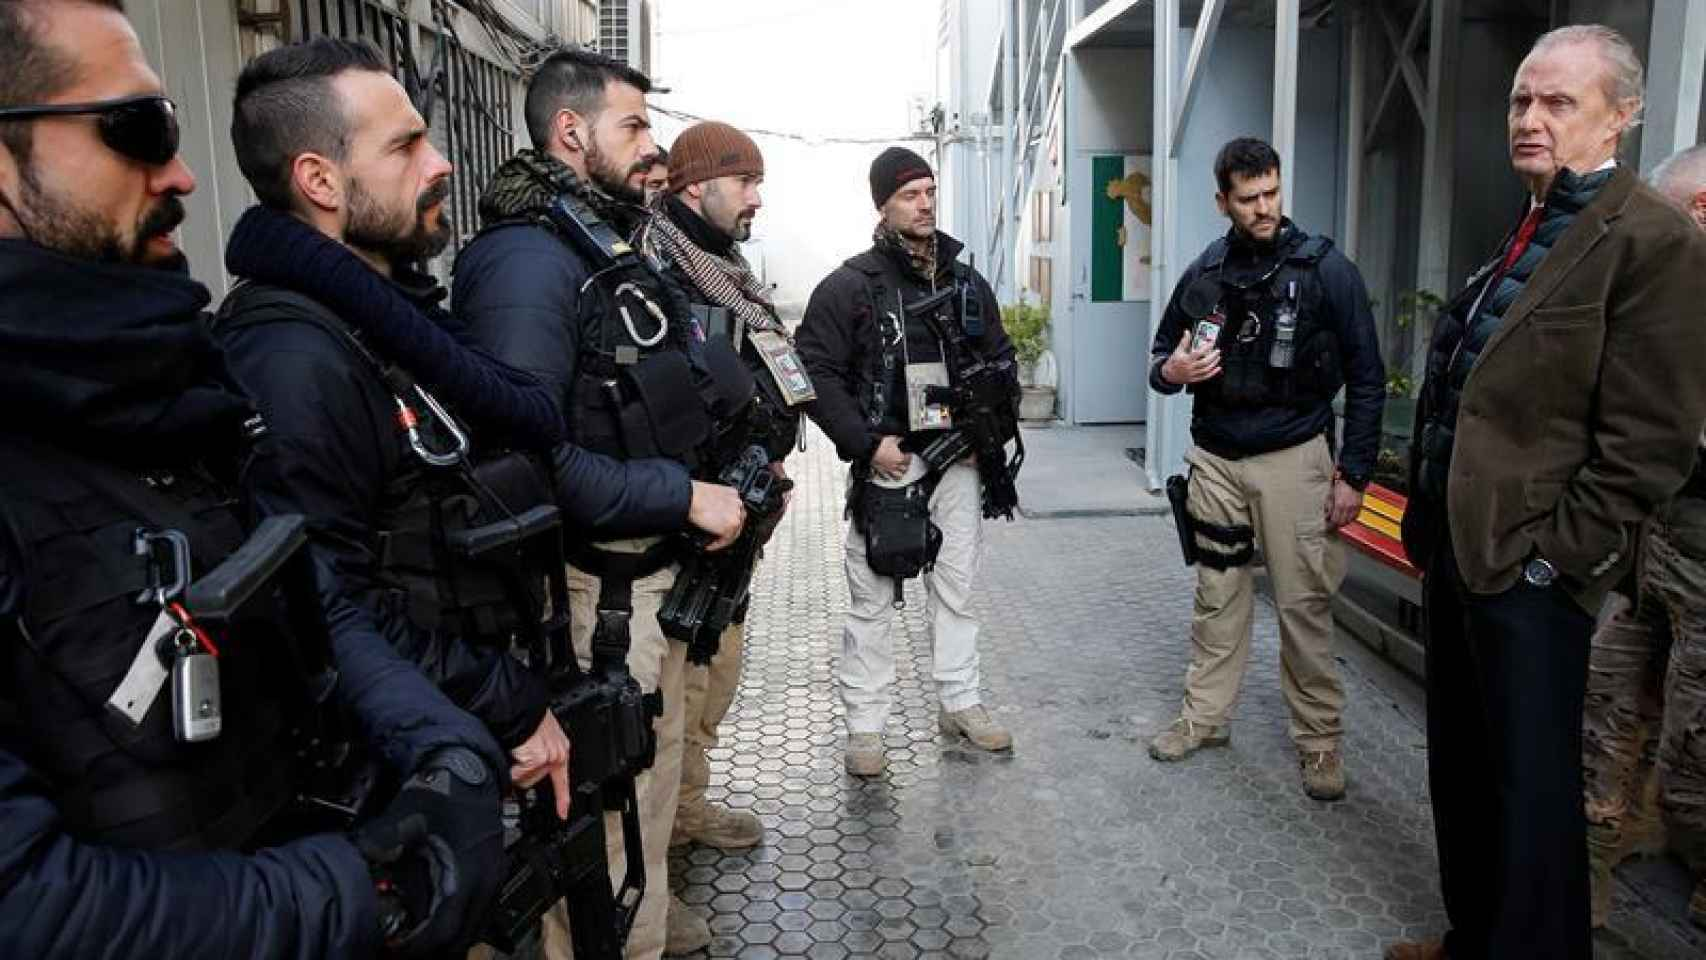 Pedro Morenés visita a las tropas españolas desplegadas en Afganistán.